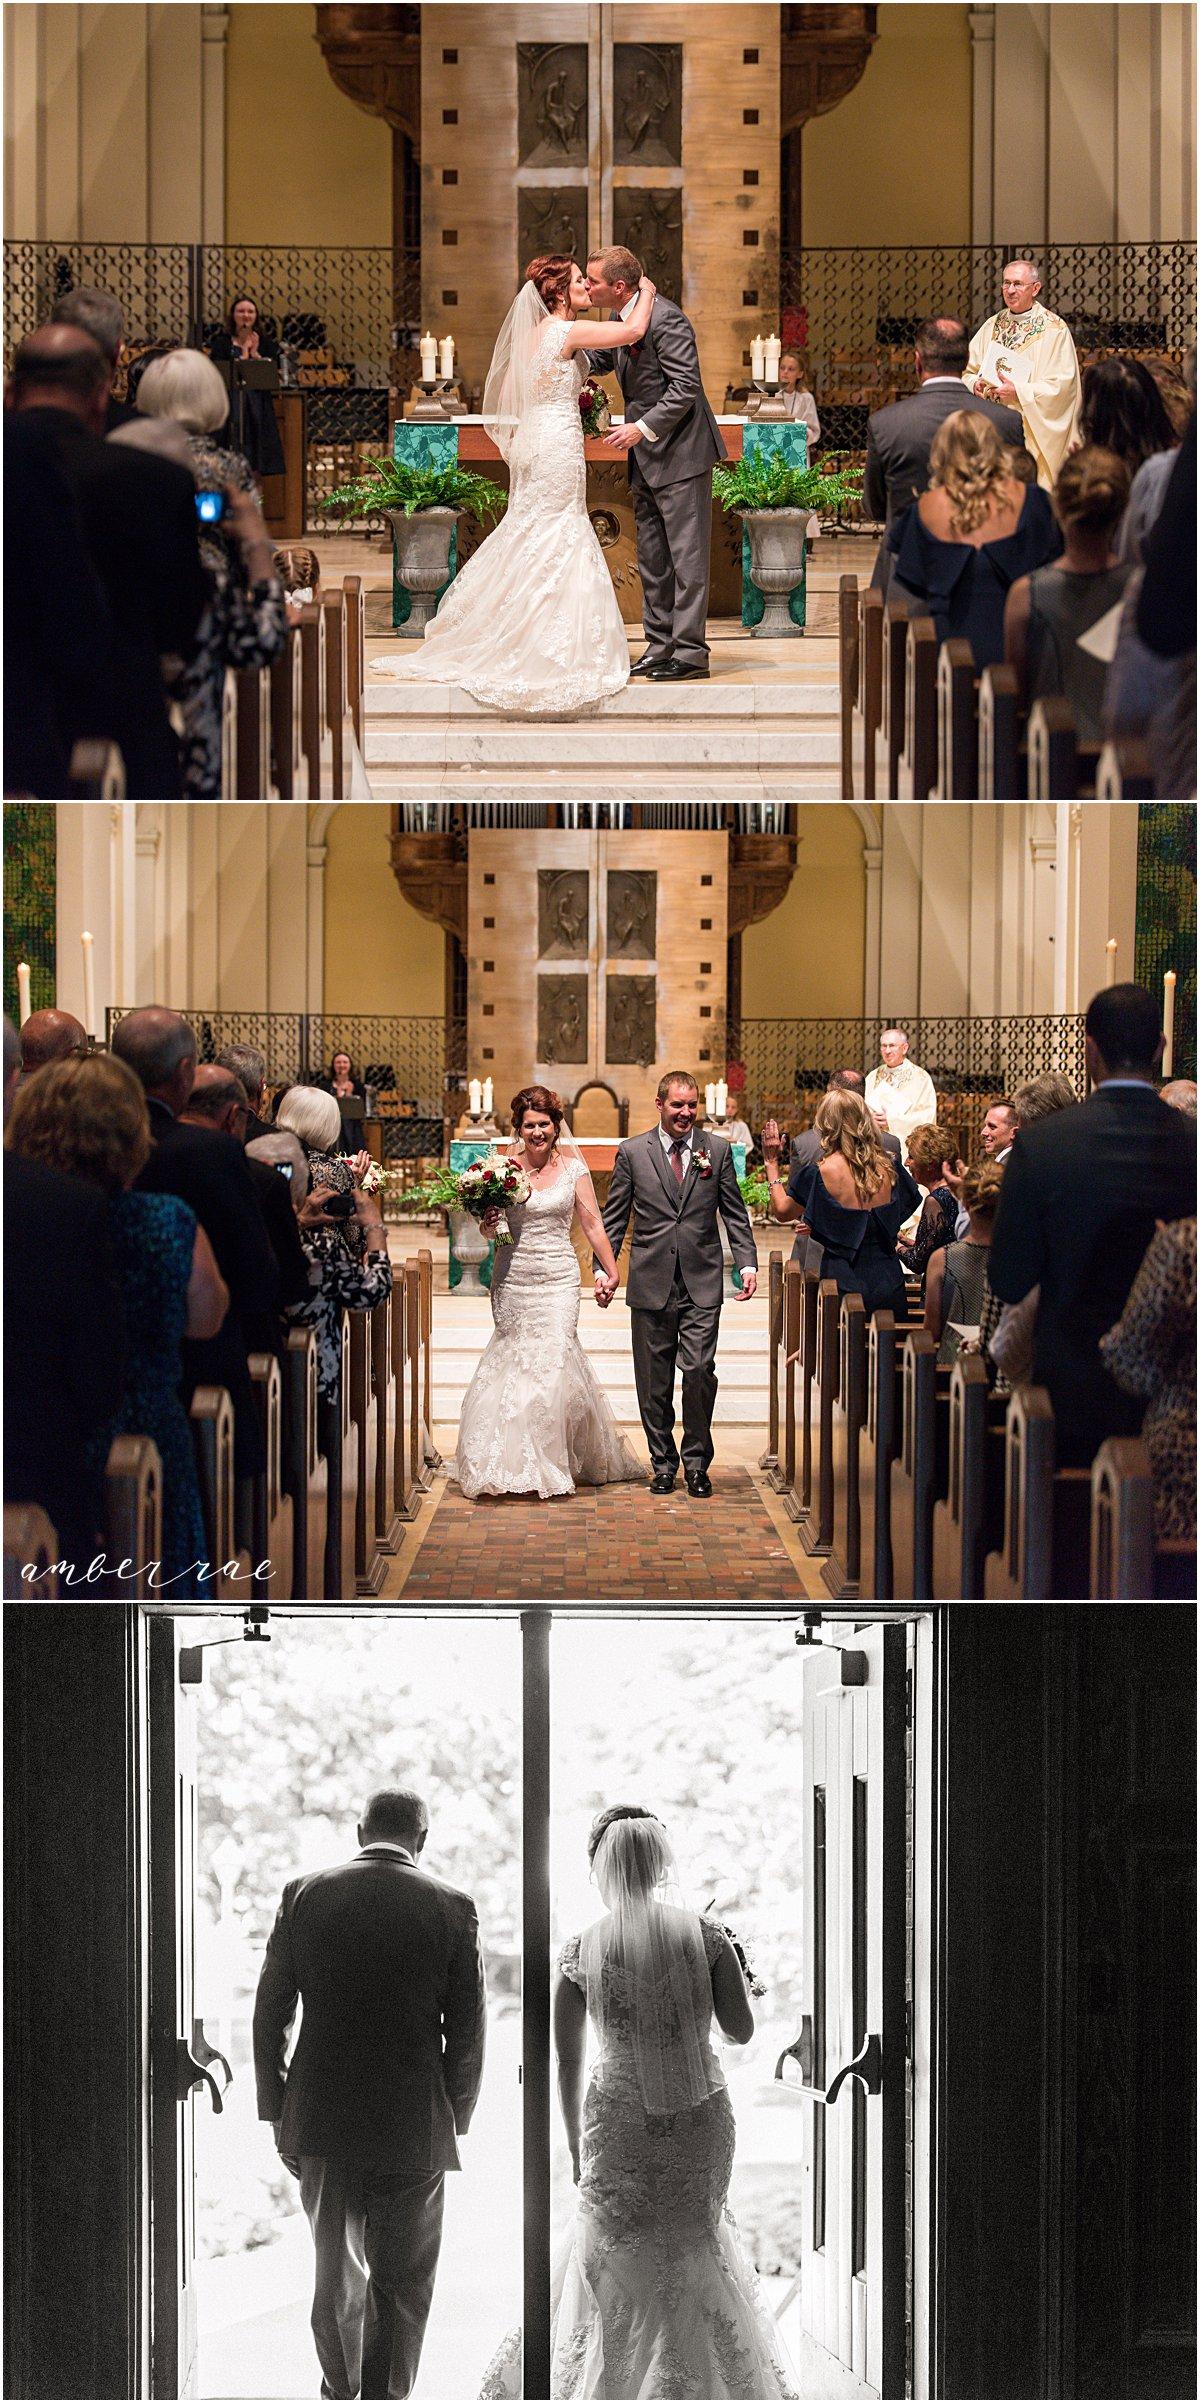 Gustafson Wedding 2018_0019.jpg